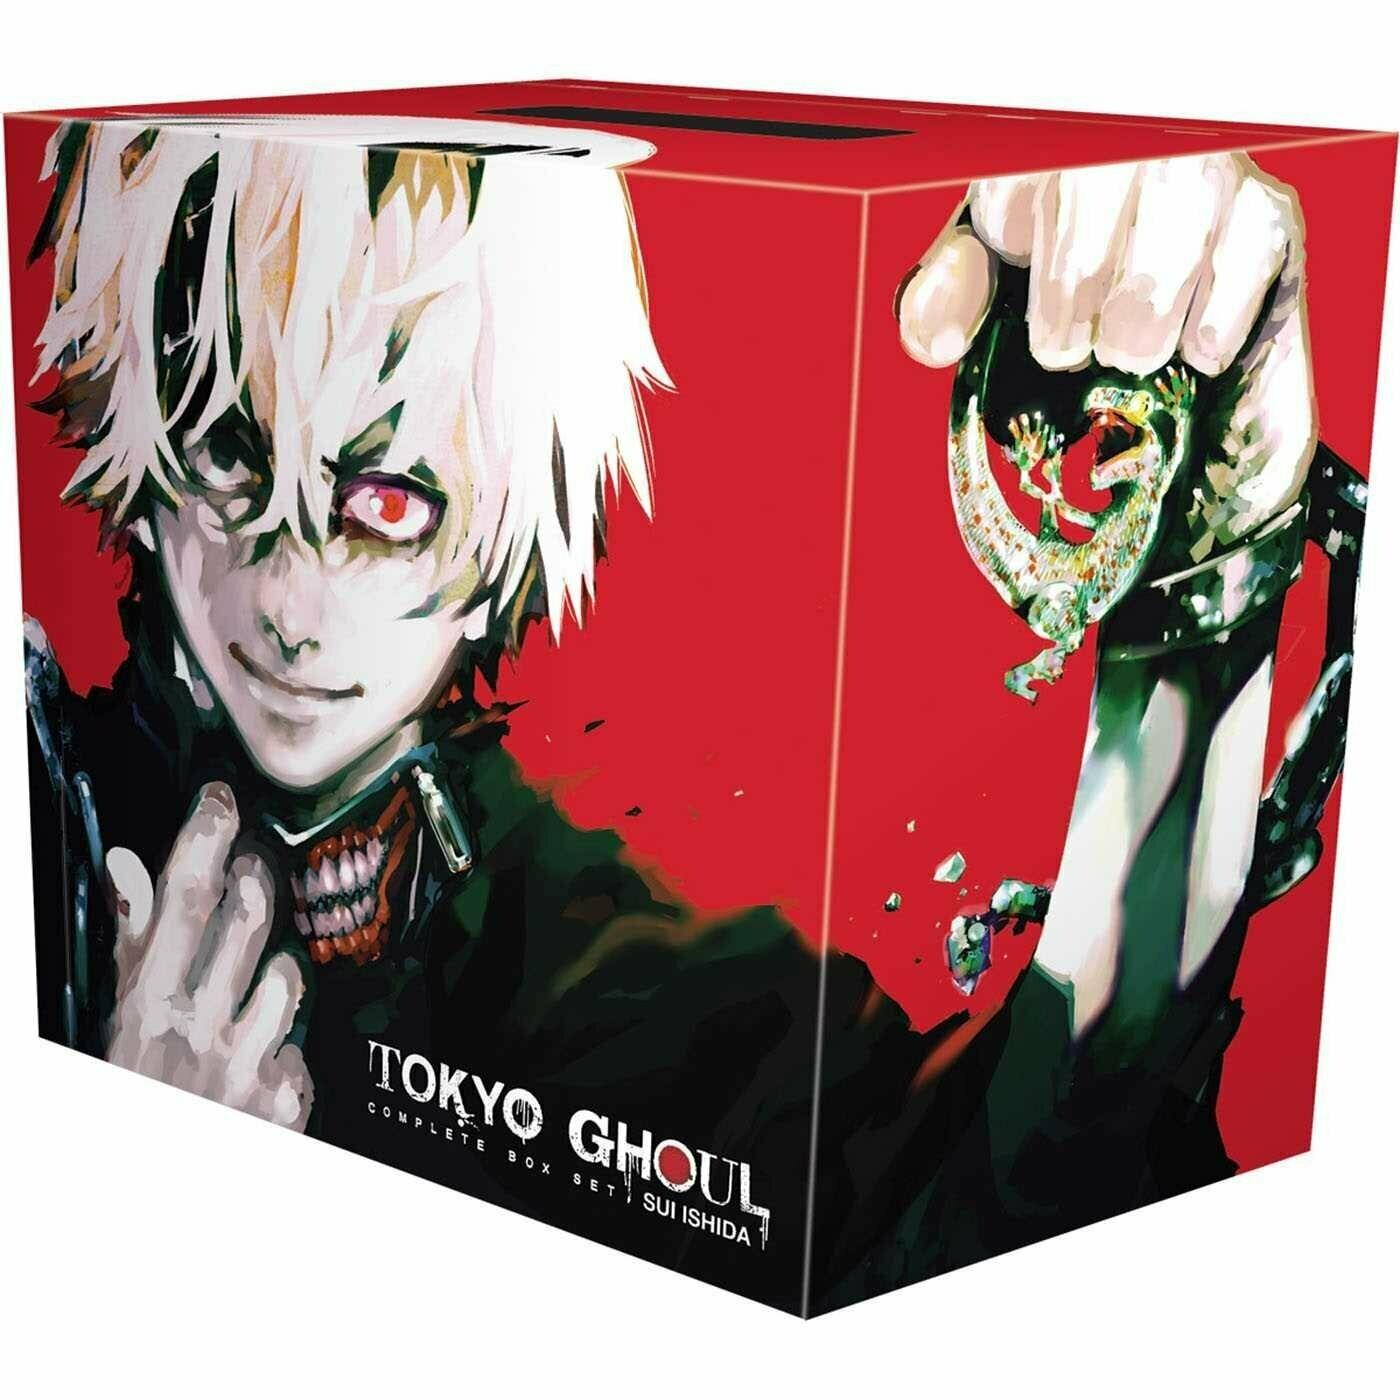 Tokyo Ghoul Complete Box Set (Vol. 1-14)